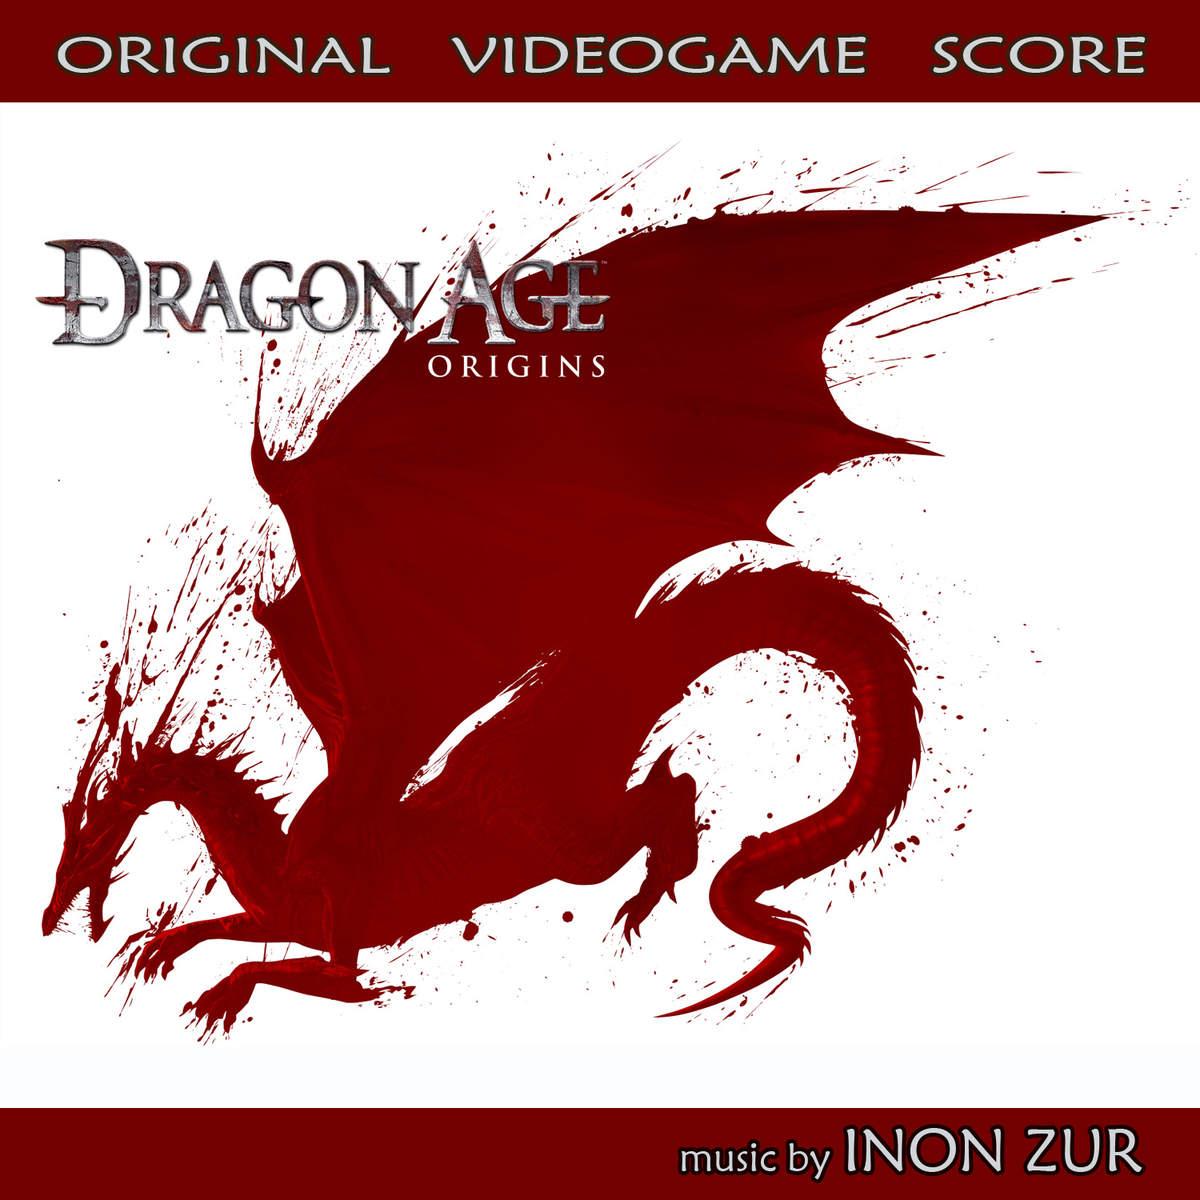 Dragon_Age_Origins_Original_Videogame_Score__cover1200x1200.jpg